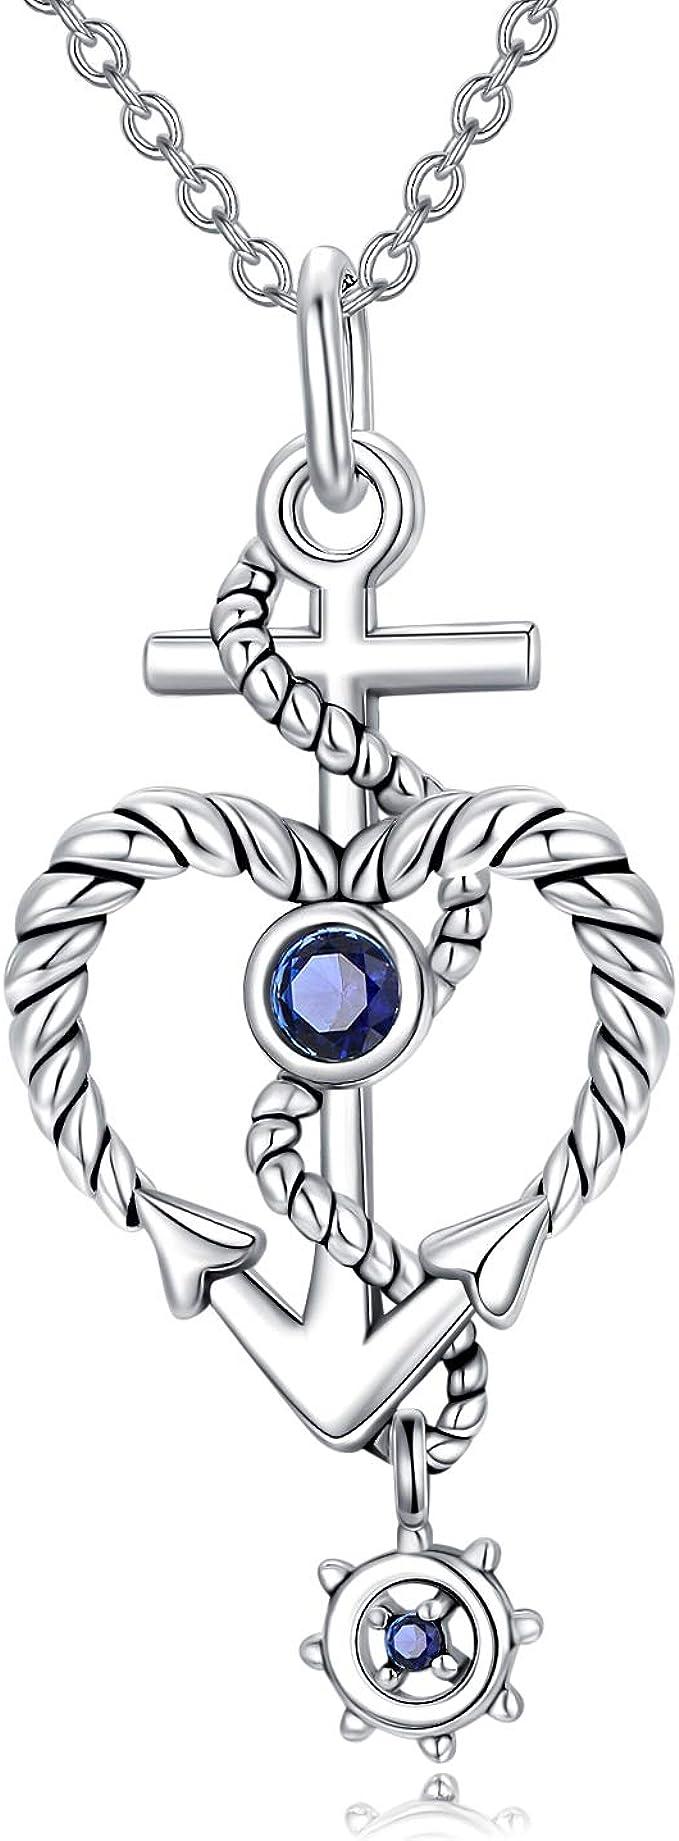 Hope Bracelet PBL- 29 Sailor Bracelet Anchor Bracelet in Silver Gold Nautical Bracelet Good Luck Jewelry